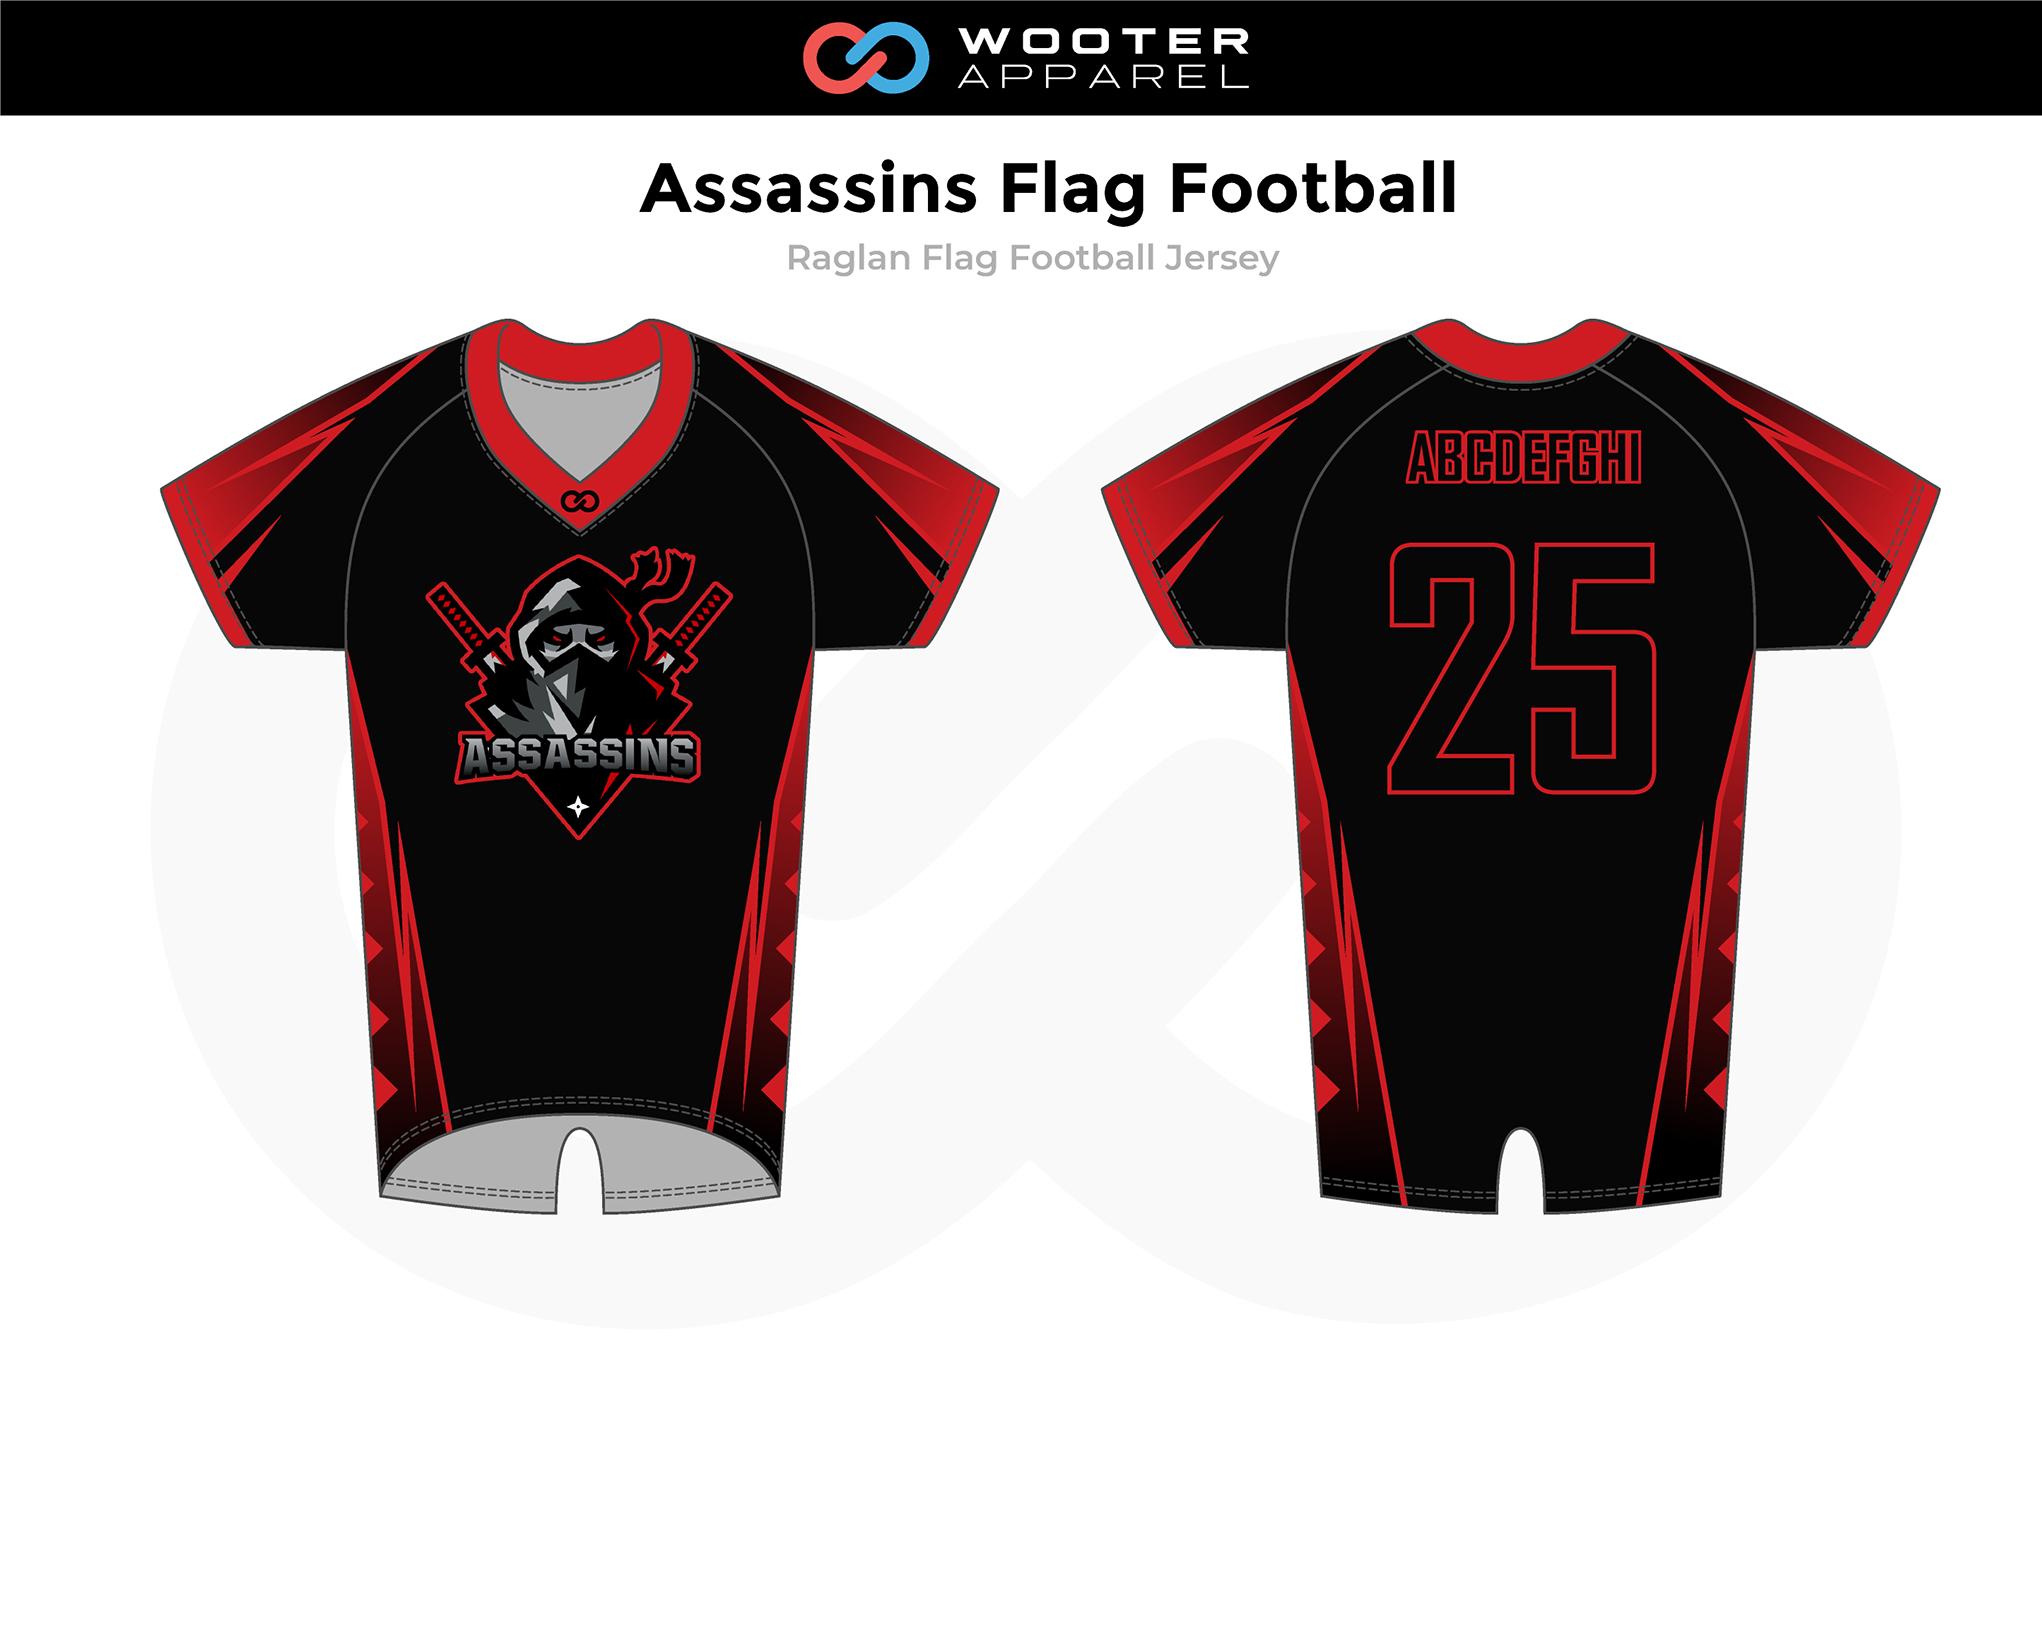 2019-01-23 Assassins Flag Football Raglan Jersey (Black).png